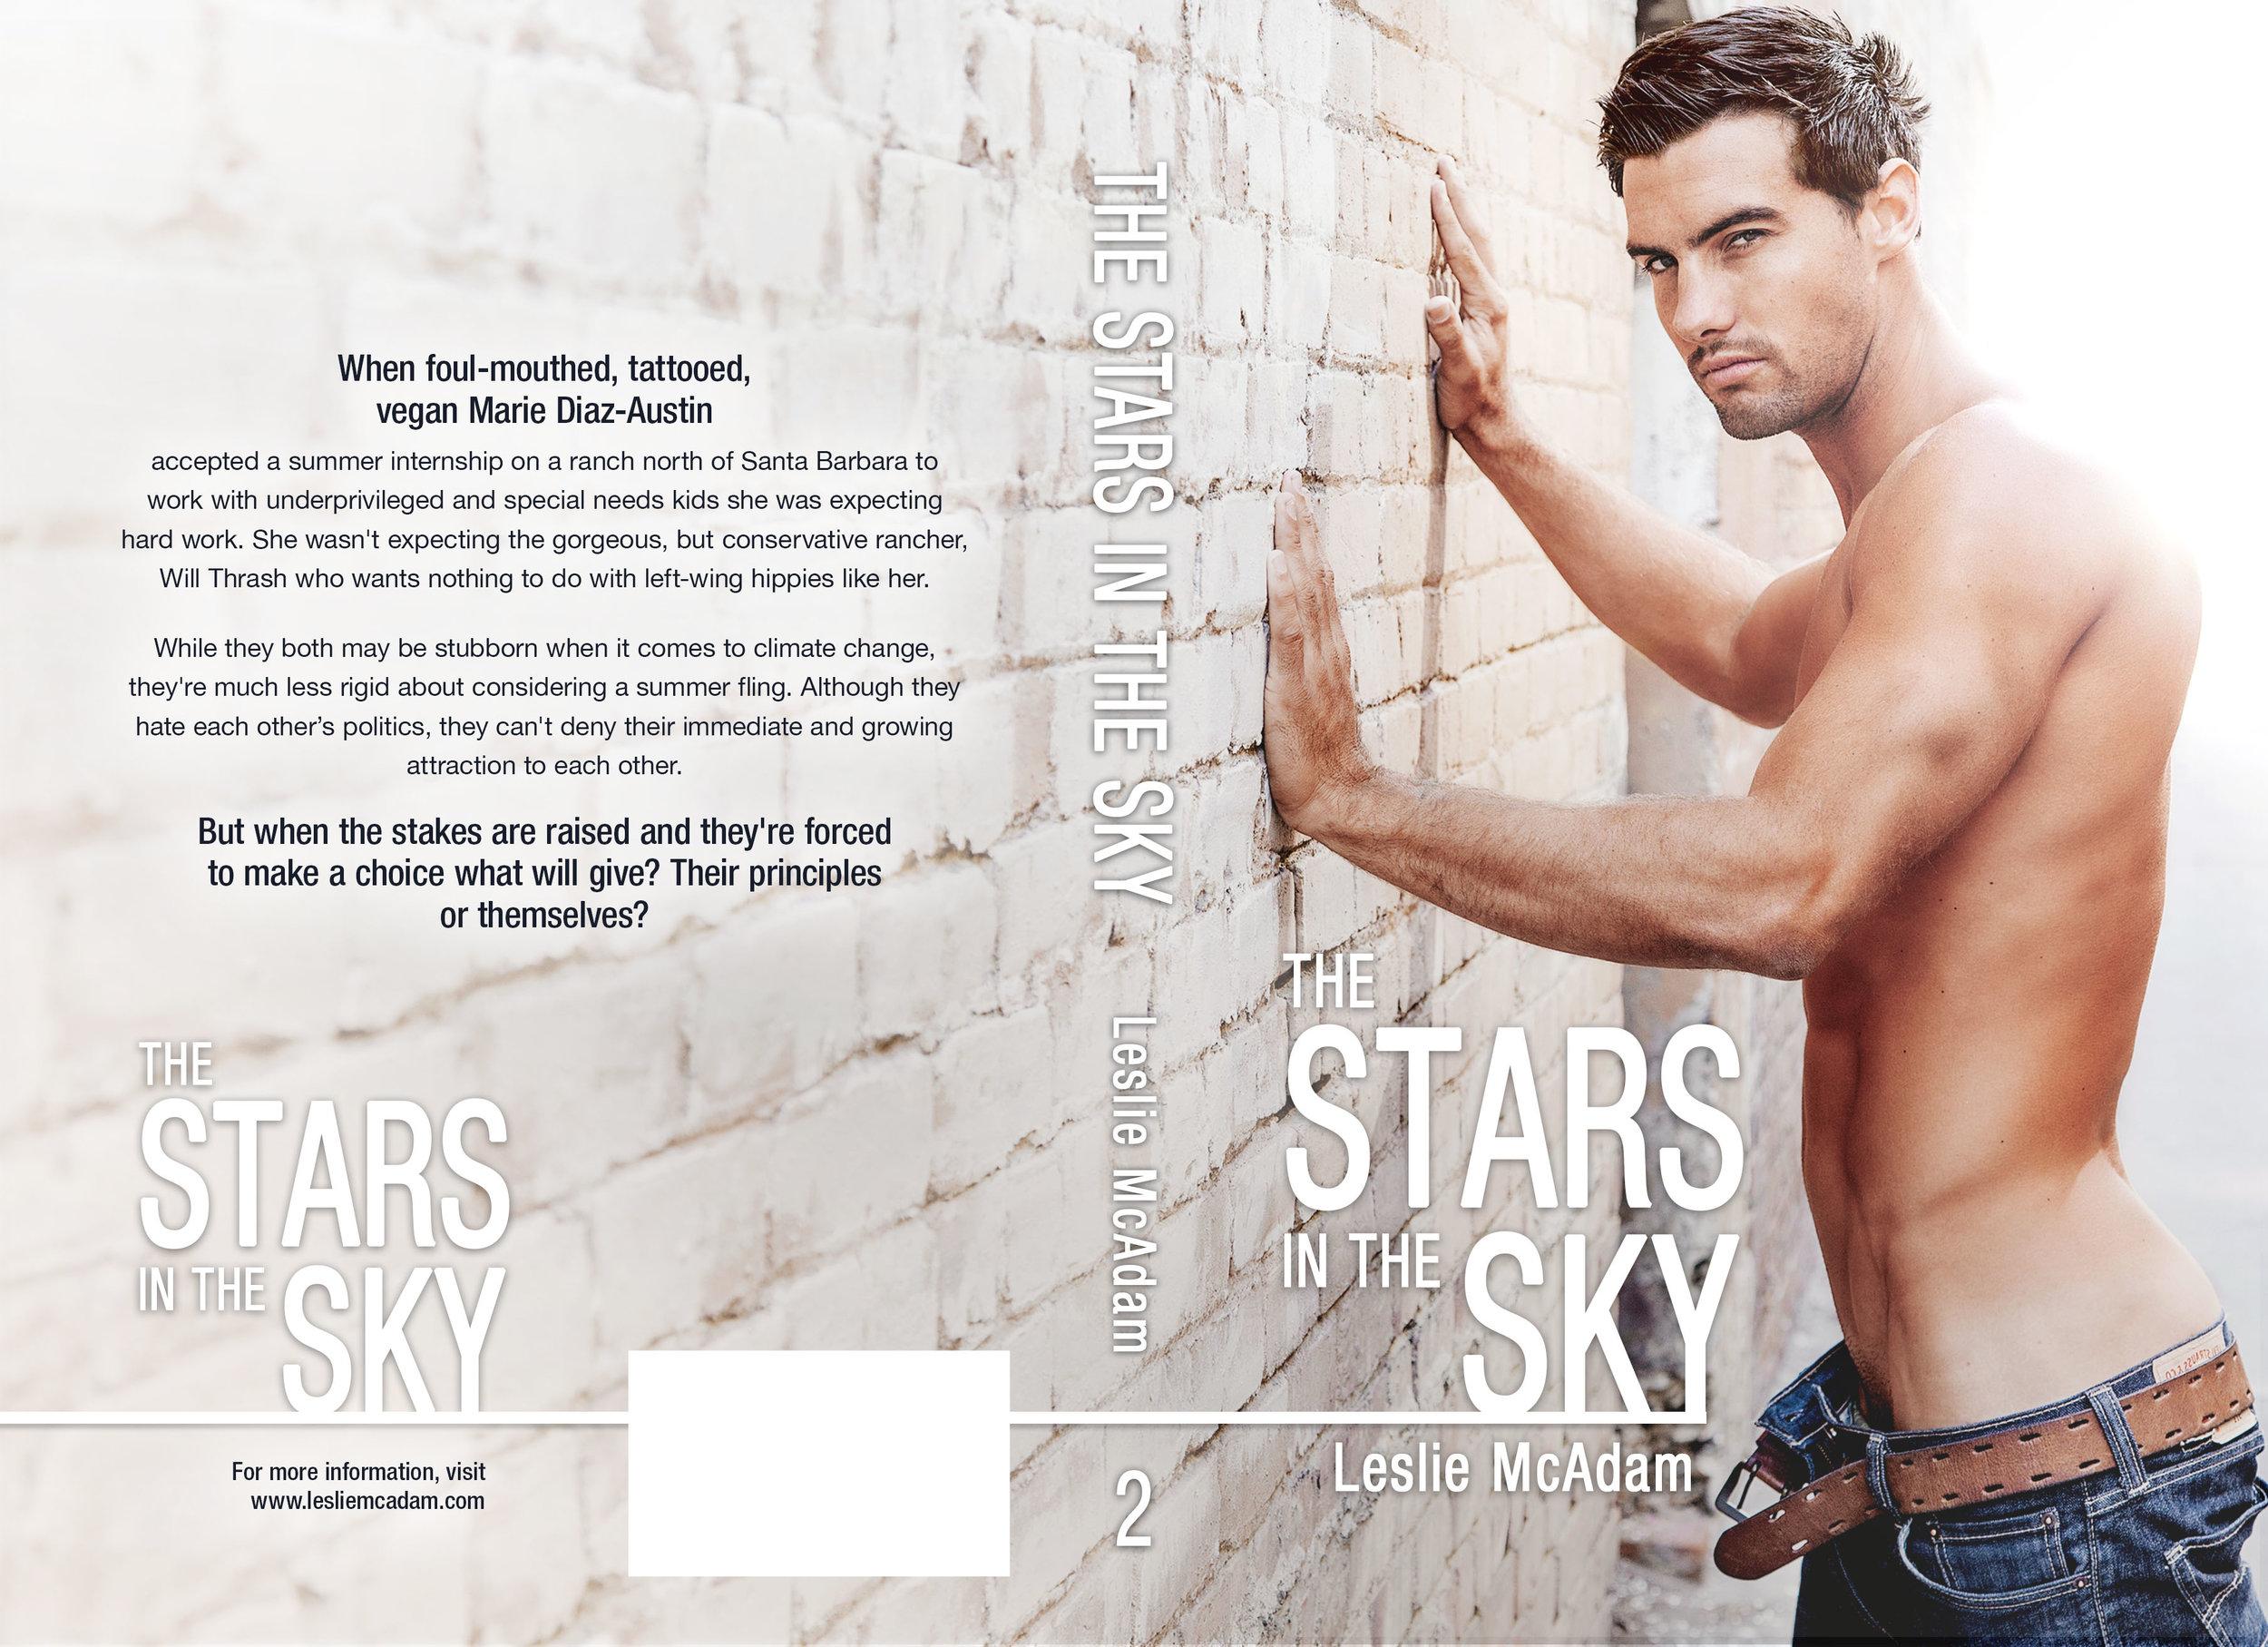 The Stars in the Sky_paperback_proof02.jpg